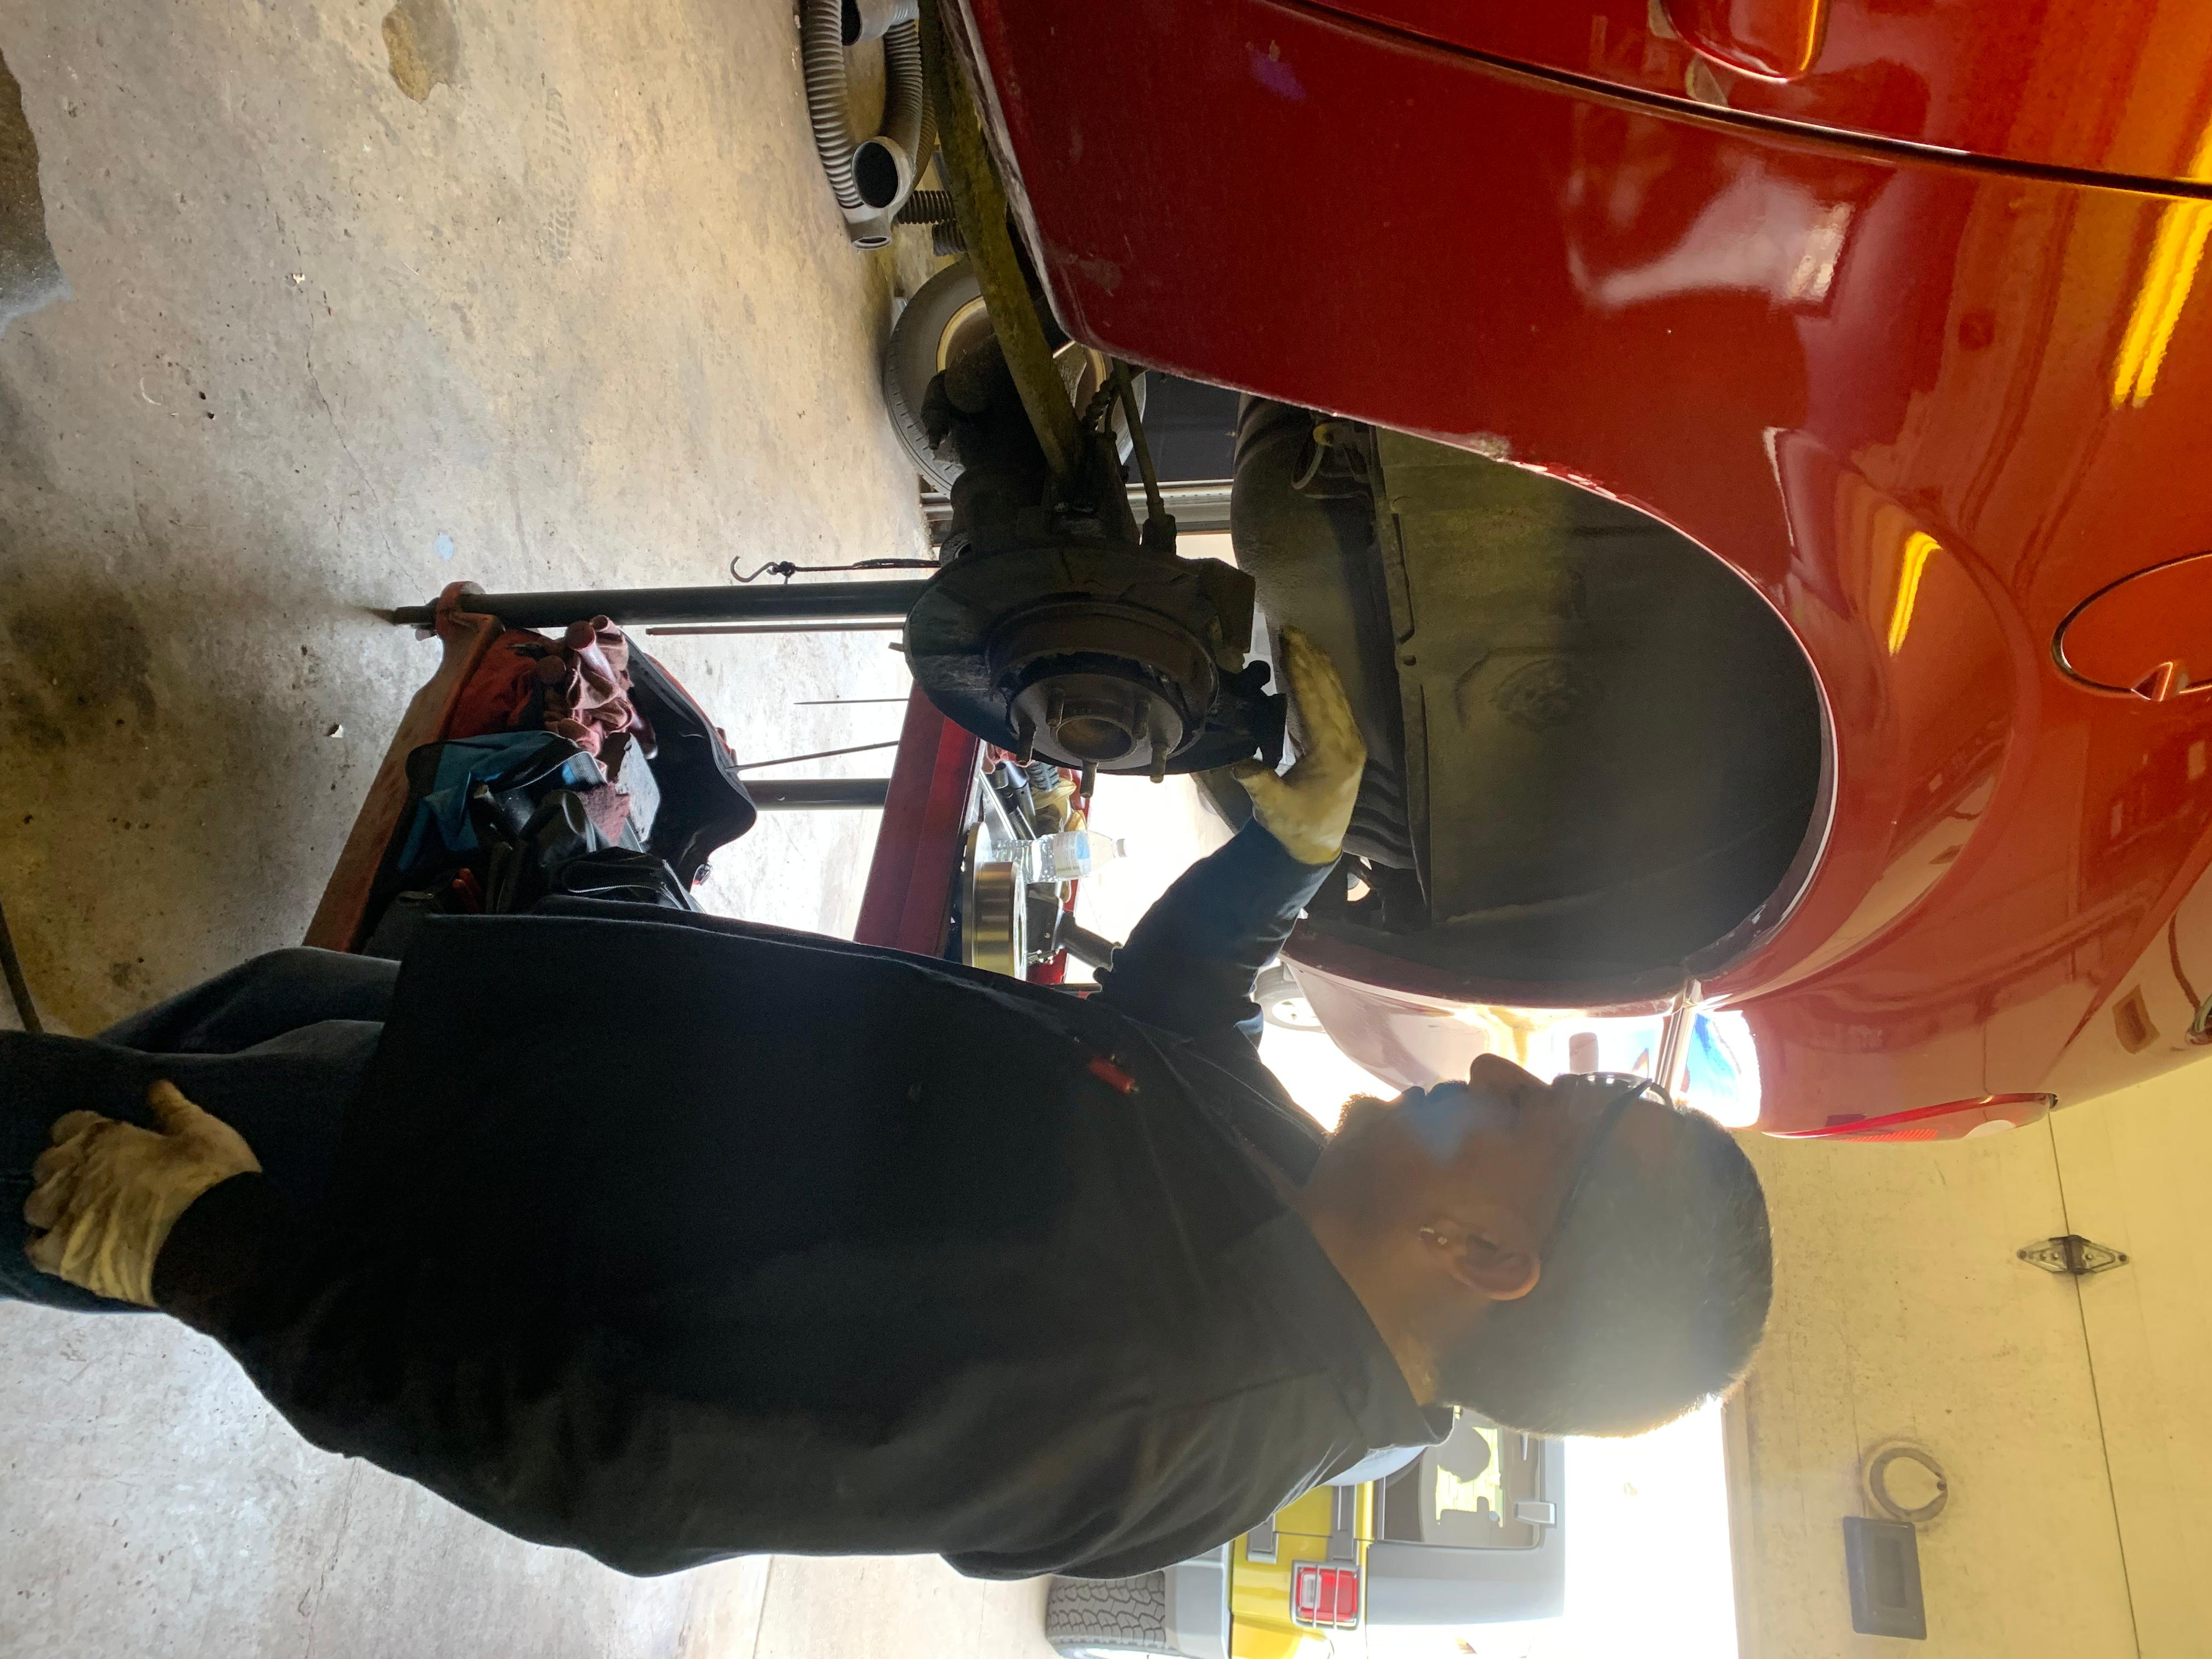 Emission Test Kenosha >> R R Automotive 6930 39th Ave Kenosha Wi 53142 Yp Com